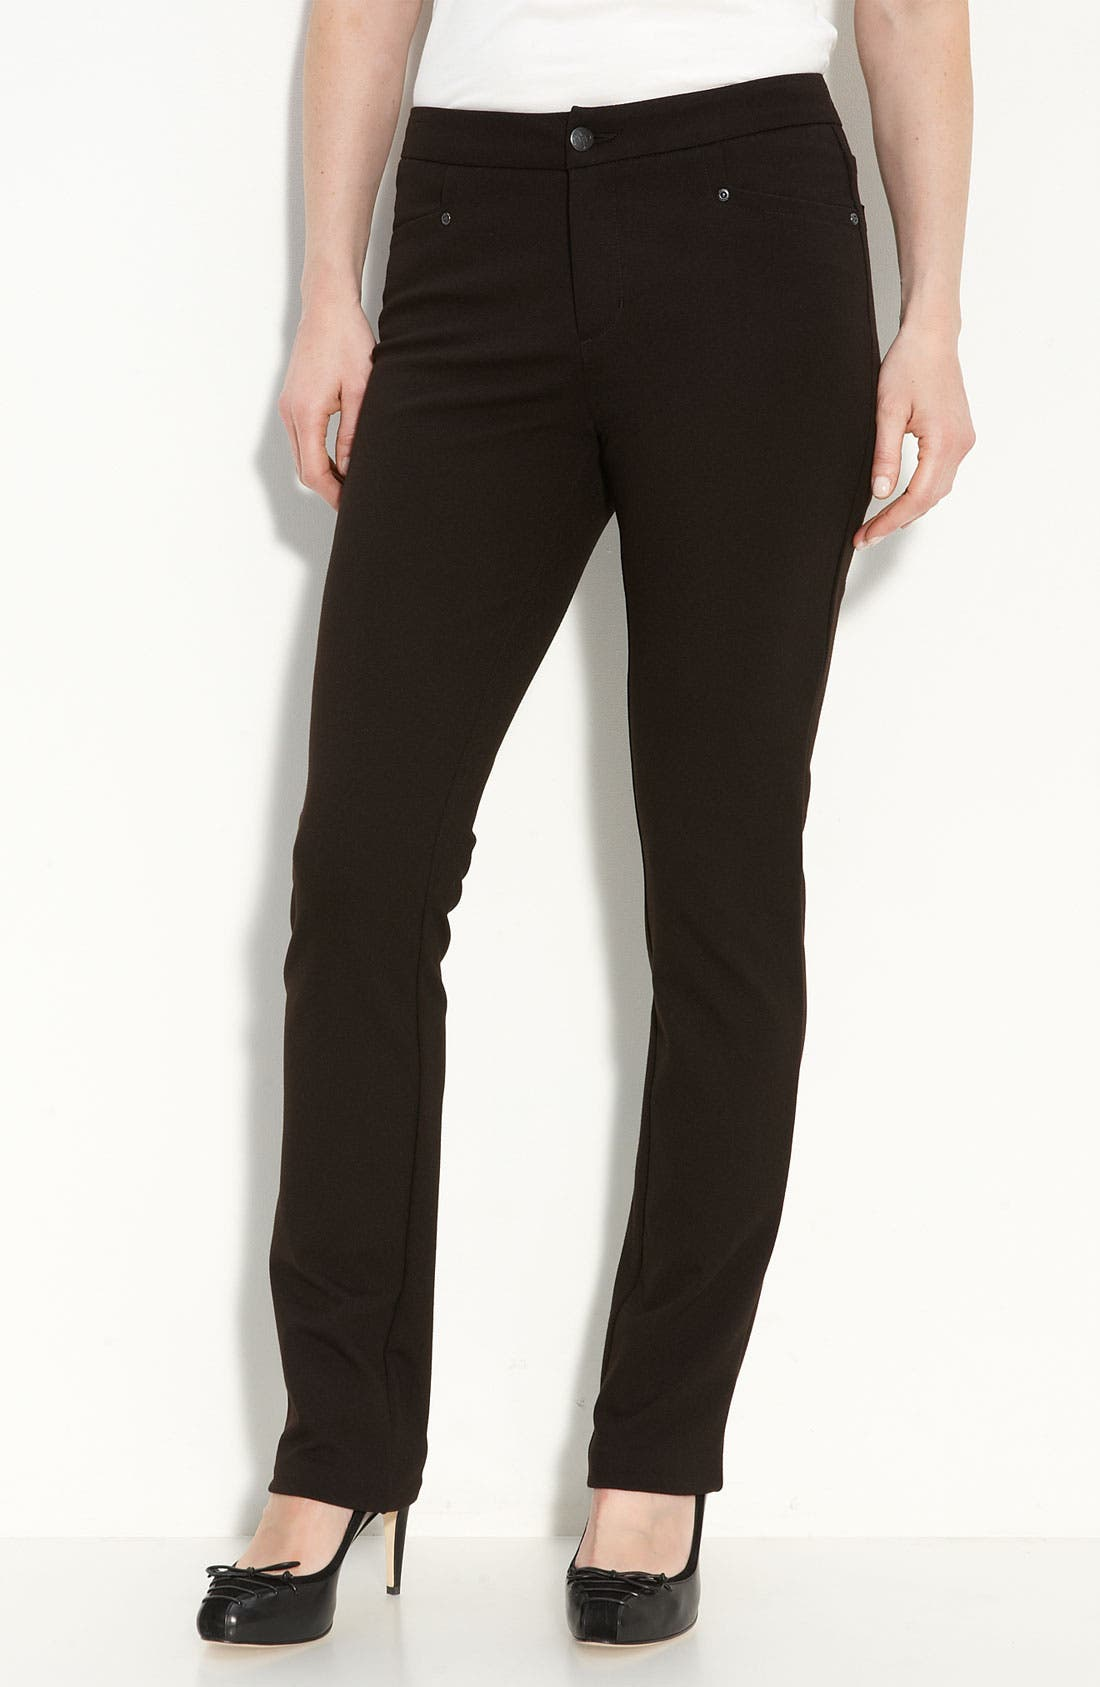 Alternate Image 1 Selected - NYDJ 'Samantha' Stretch Ponte Knit Pants